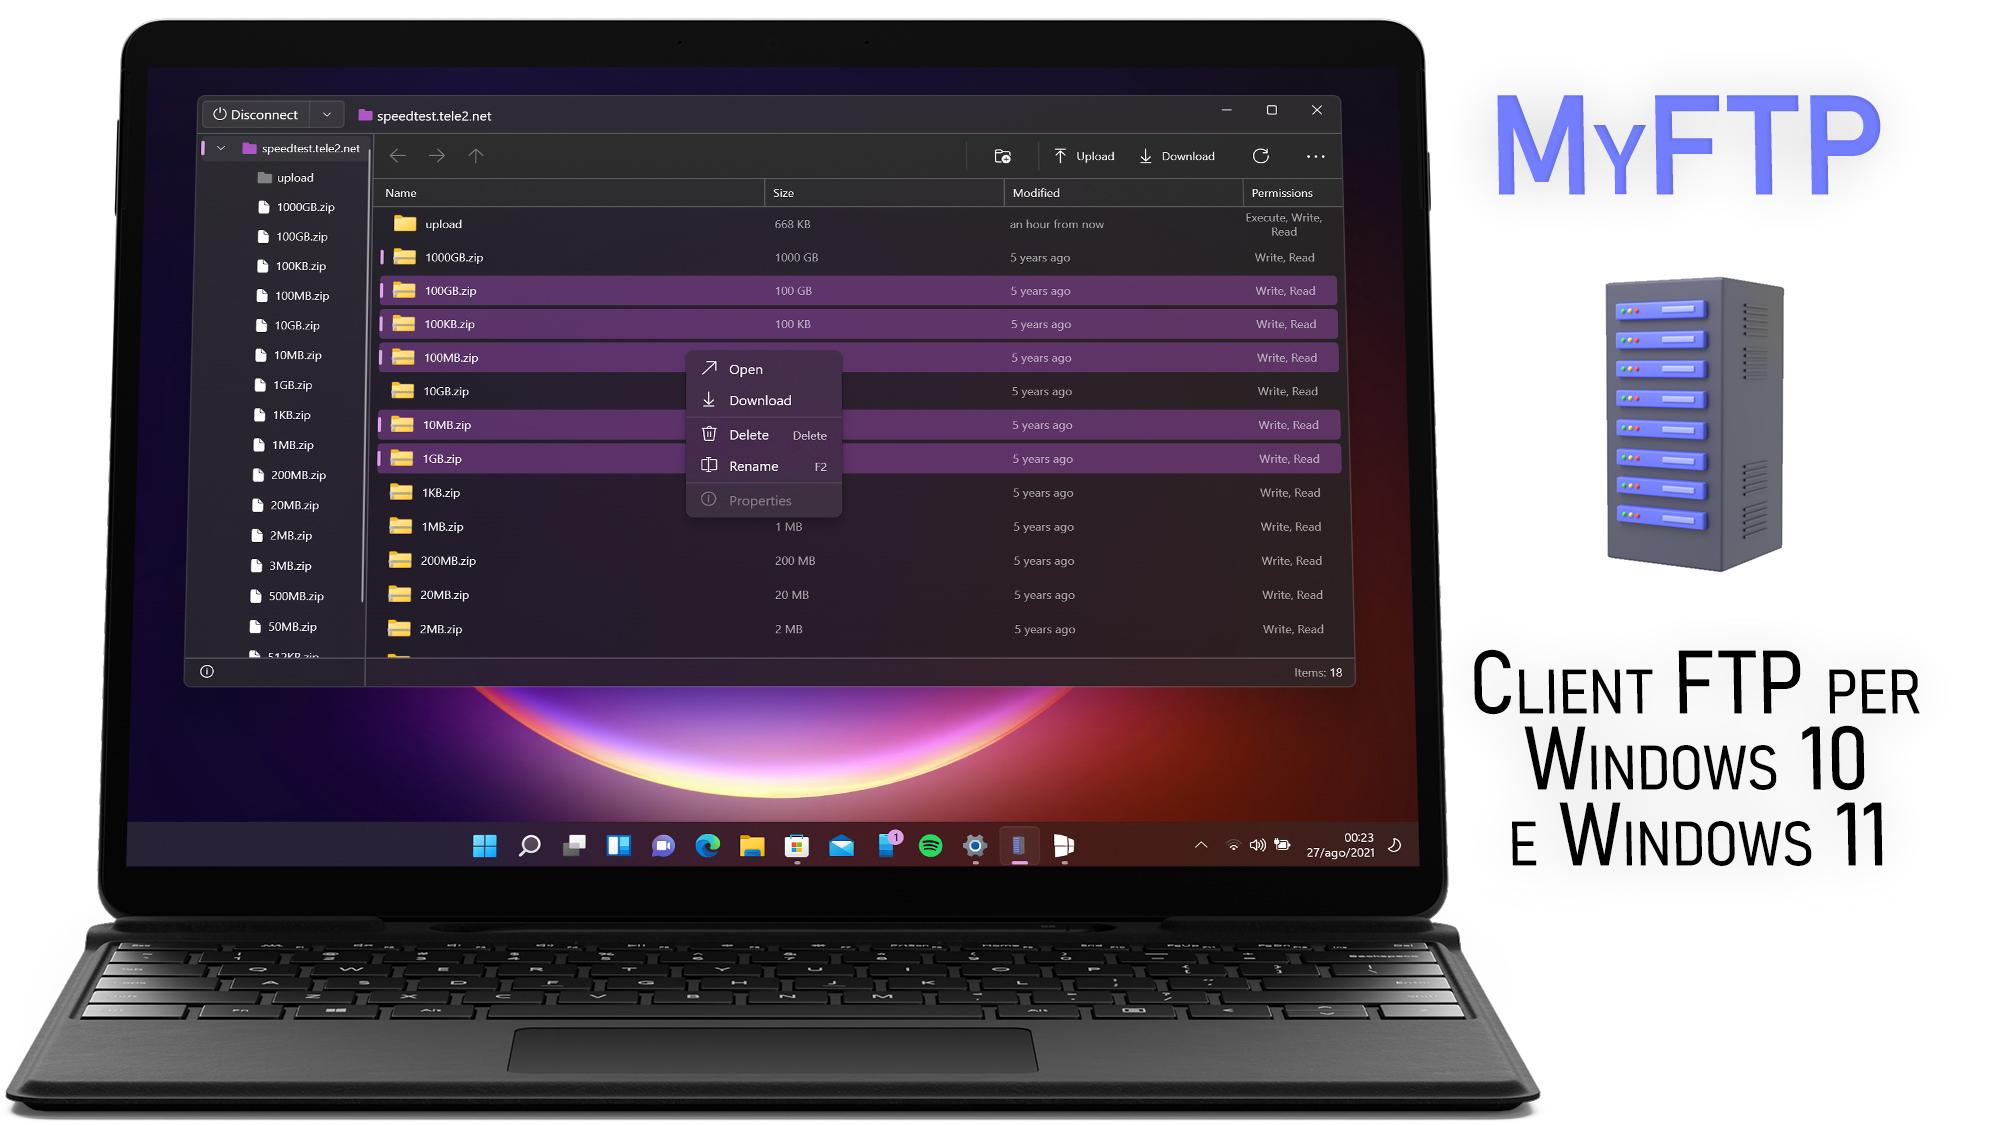 MyFTP - Client FTP per Windows 10 e Windows 11